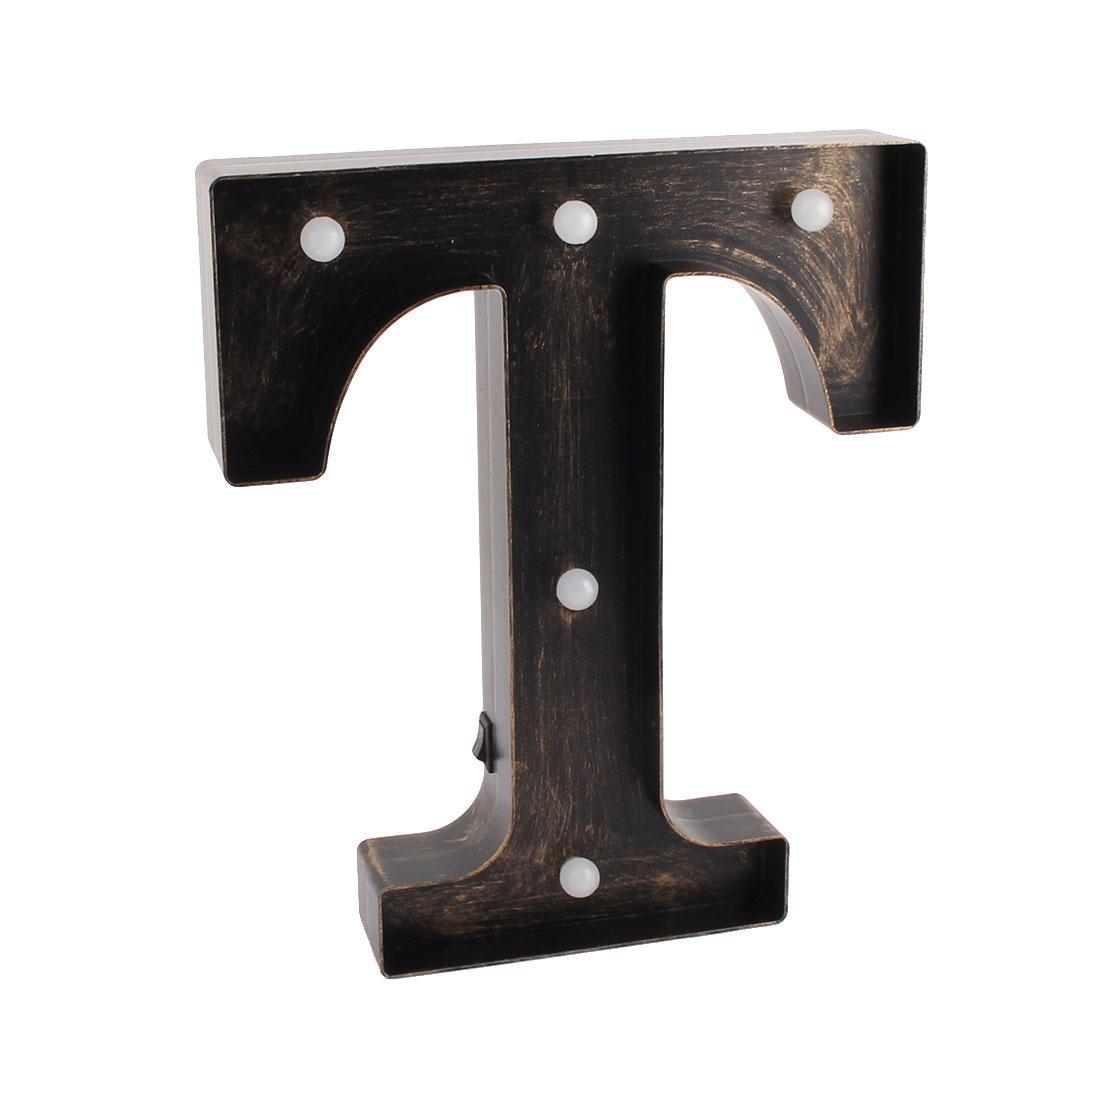 Bedroom Plastic Decor English T Letter Alphabet Word Free DIY LED Light Bronze Tone